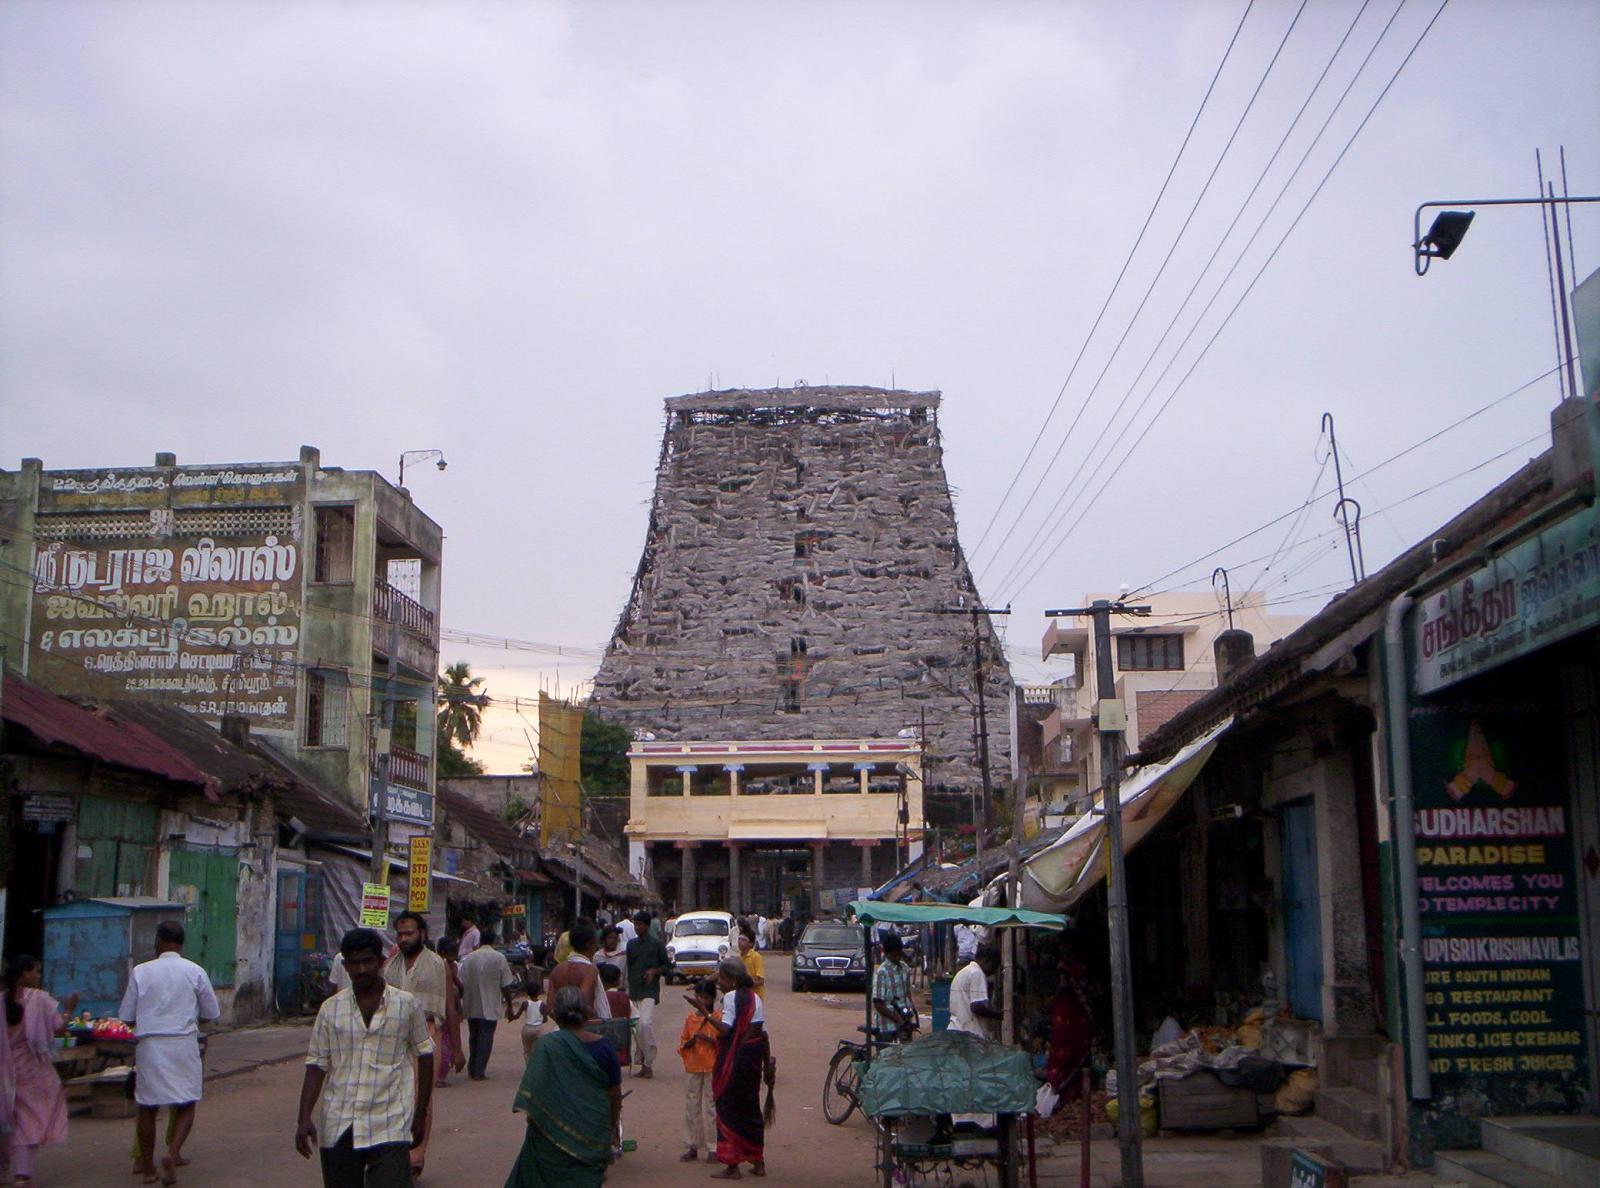 Chidambaram India  City pictures : Chidambaram Nataraja temple – photo gallery, photos of India